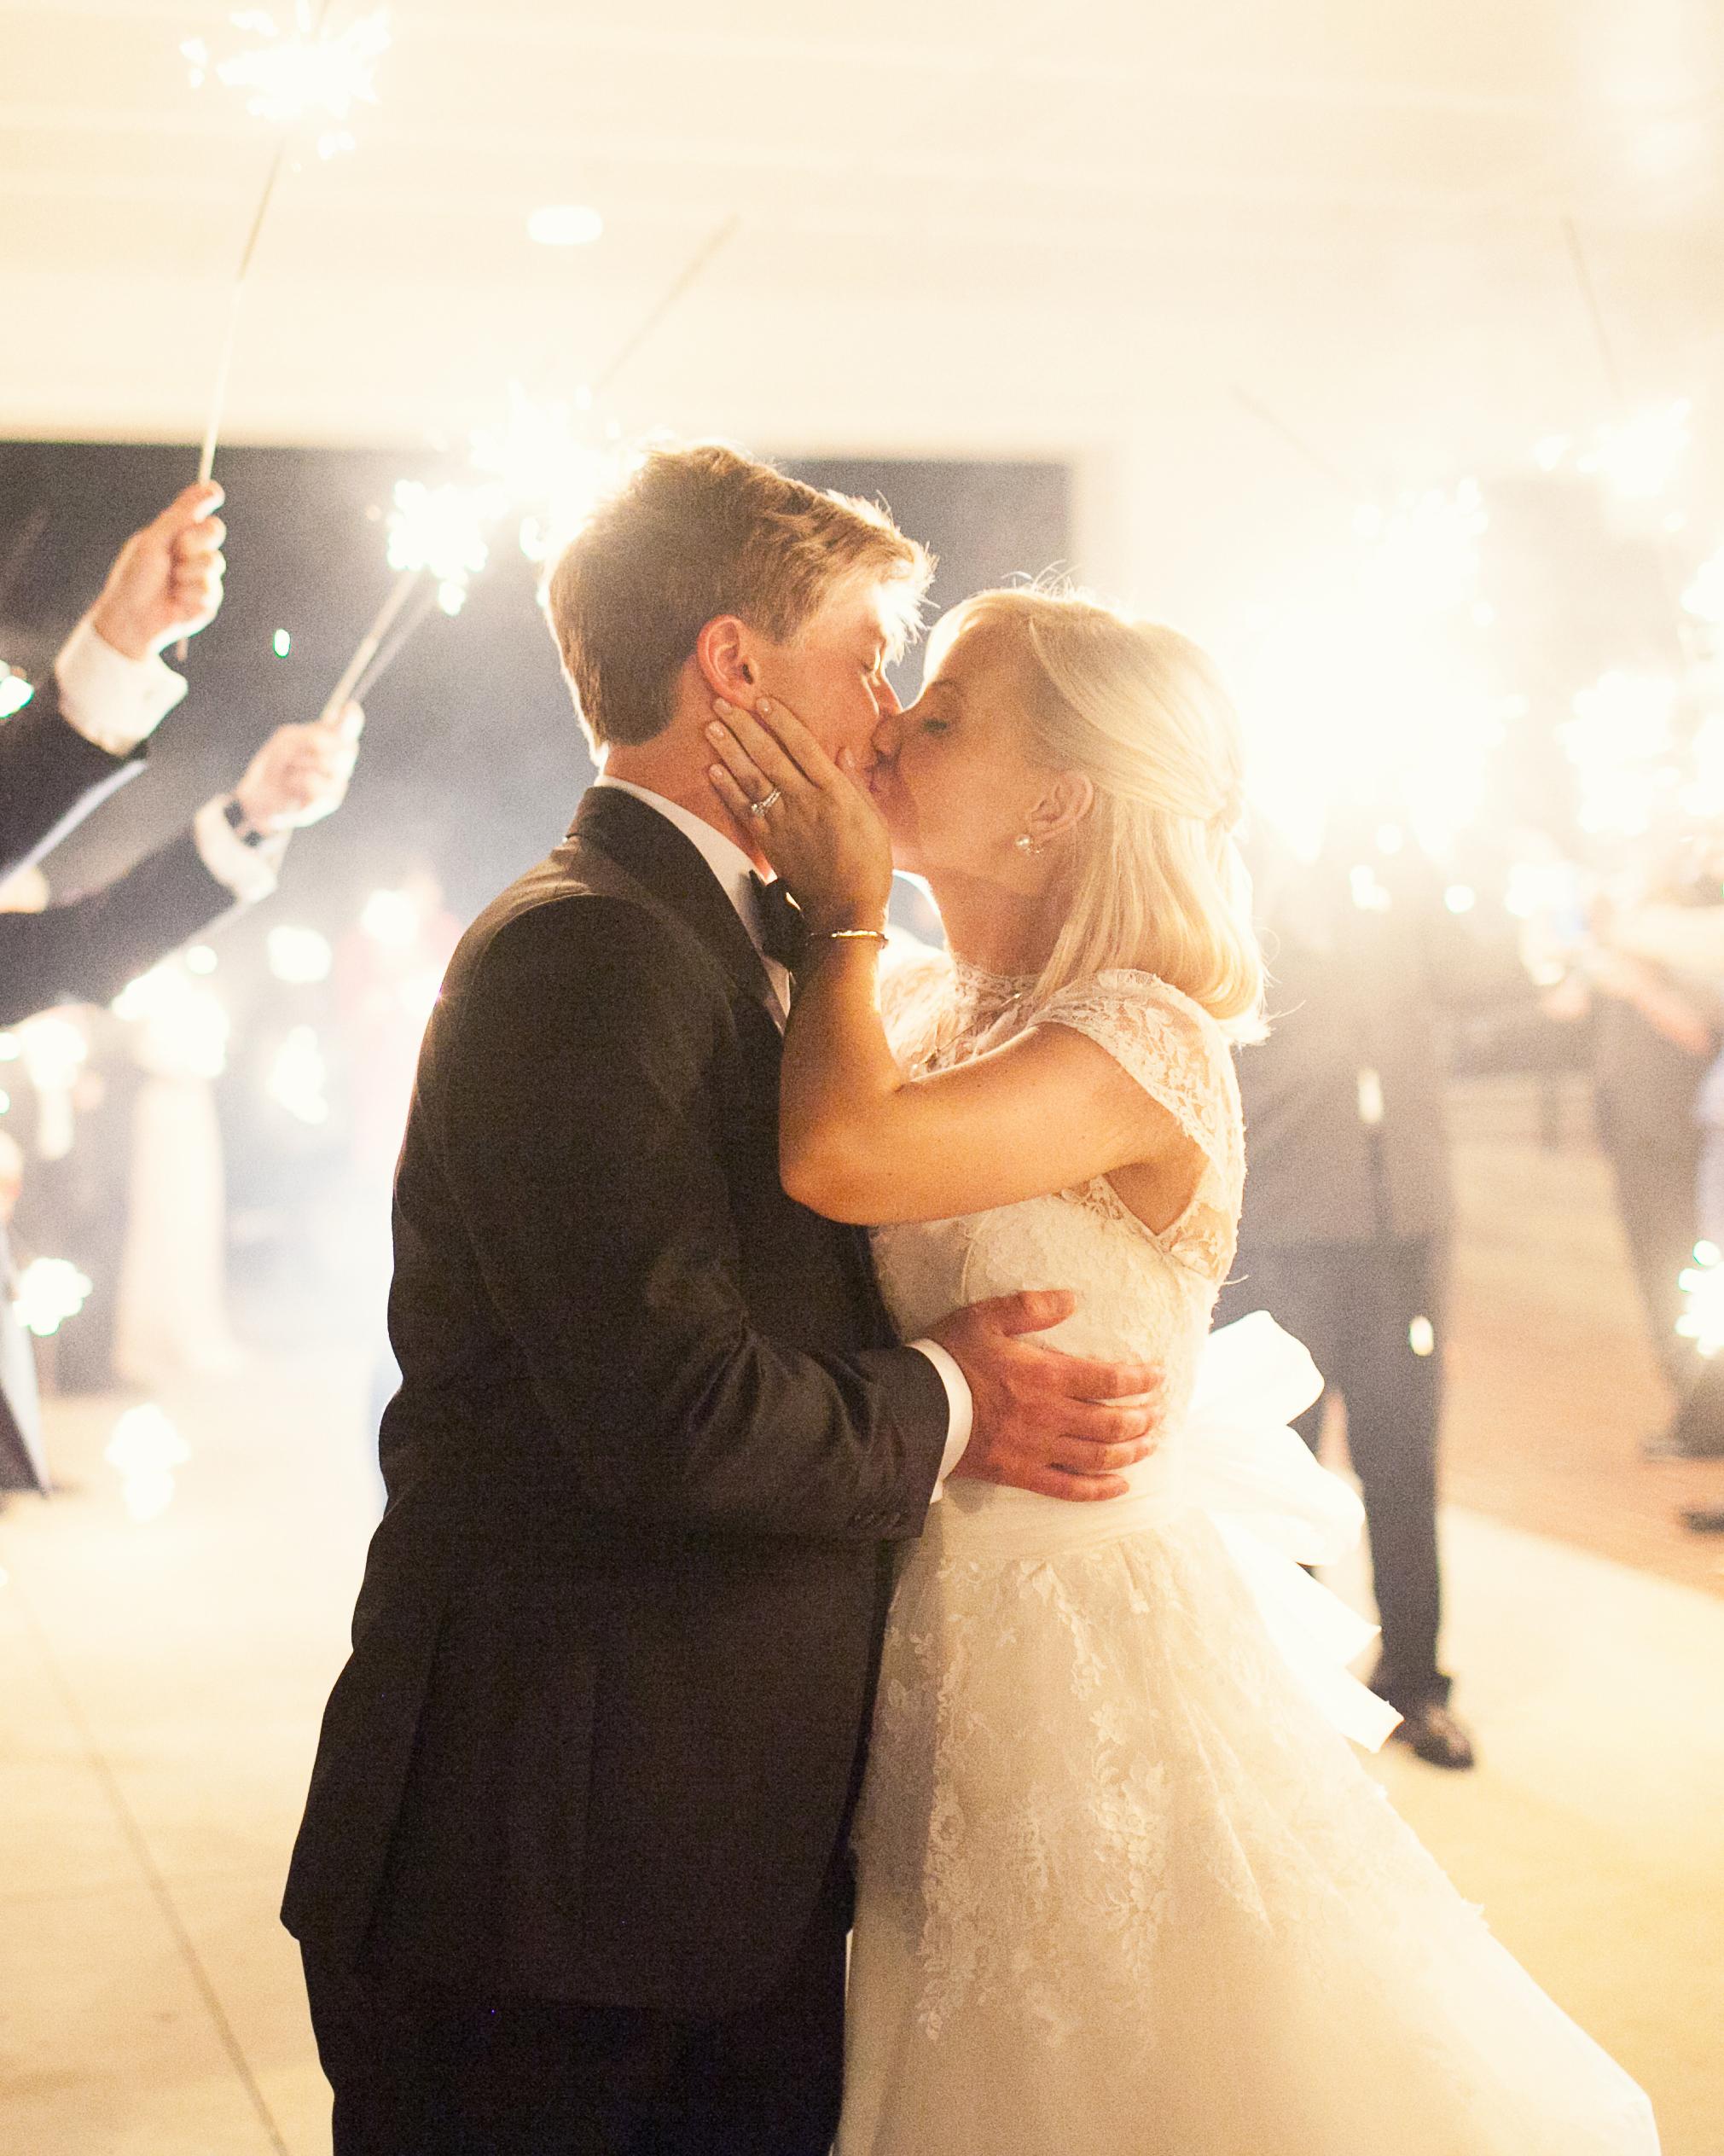 molly-patrick-wedding-sparklers-3798-s111760-0115.jpg